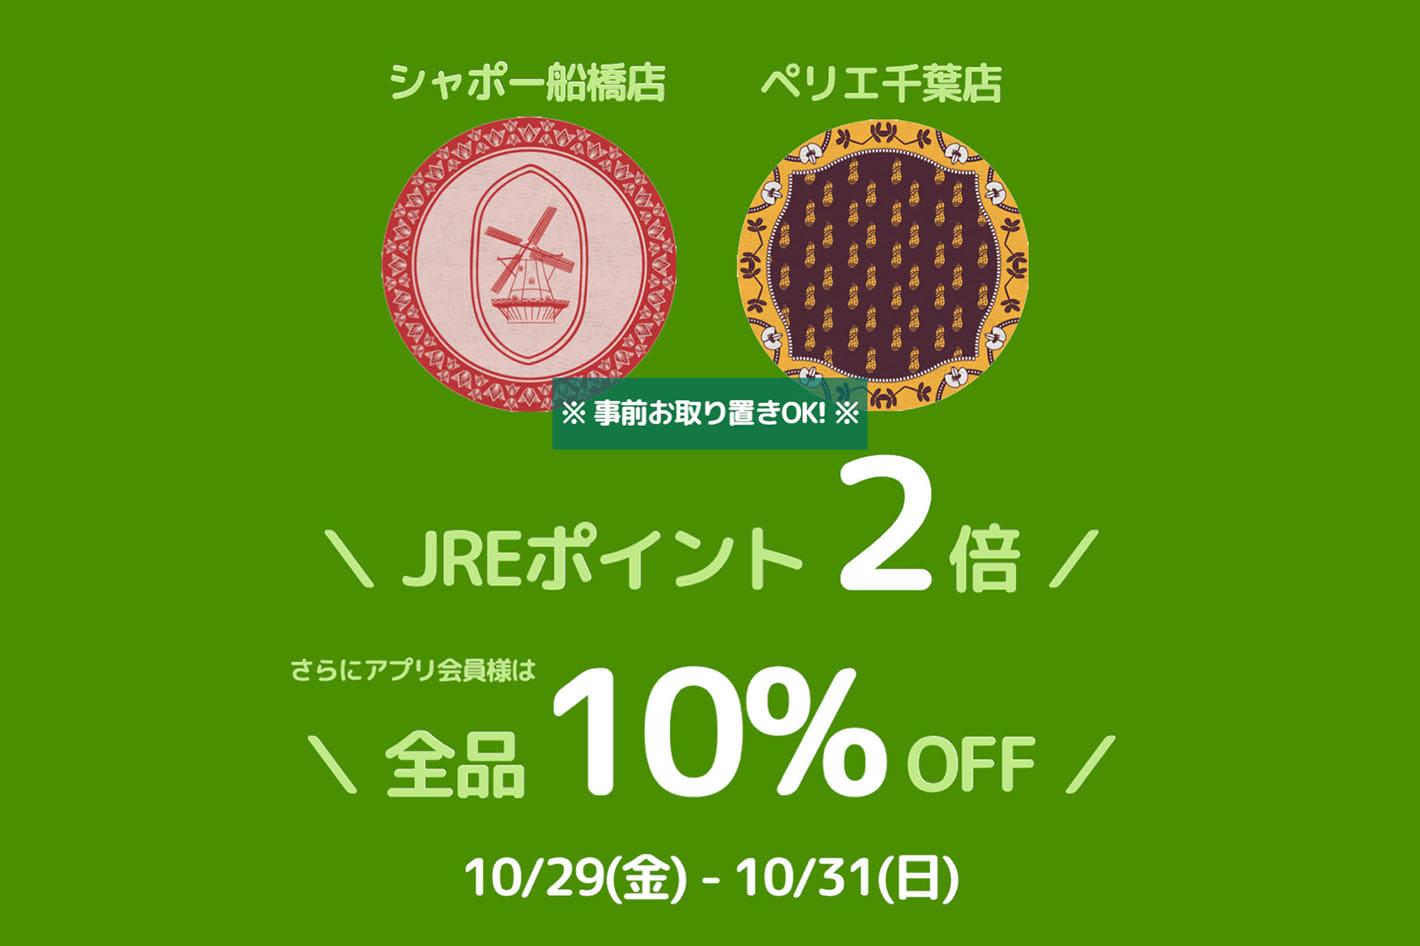 ear PAPILLONNER 【予告】シャポー船橋店・ペリエ千葉店限定!<br>JREポイント2倍&全品10%OFF!